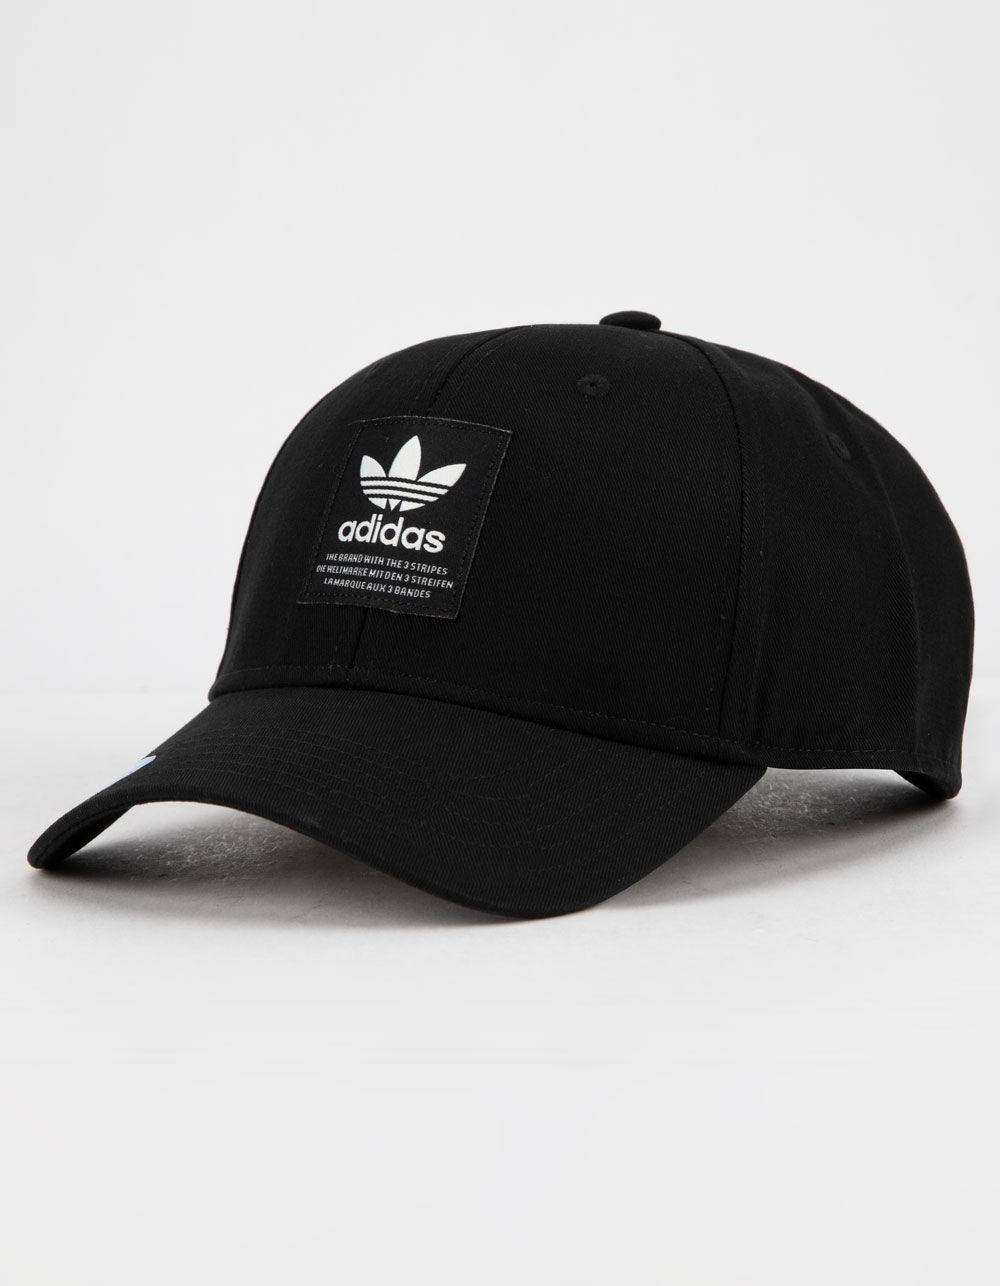 457858ed8bd Adidas - Originals Trefoil Patch Black   White Mens Snapback Hat for Men -  Lyst. View fullscreen